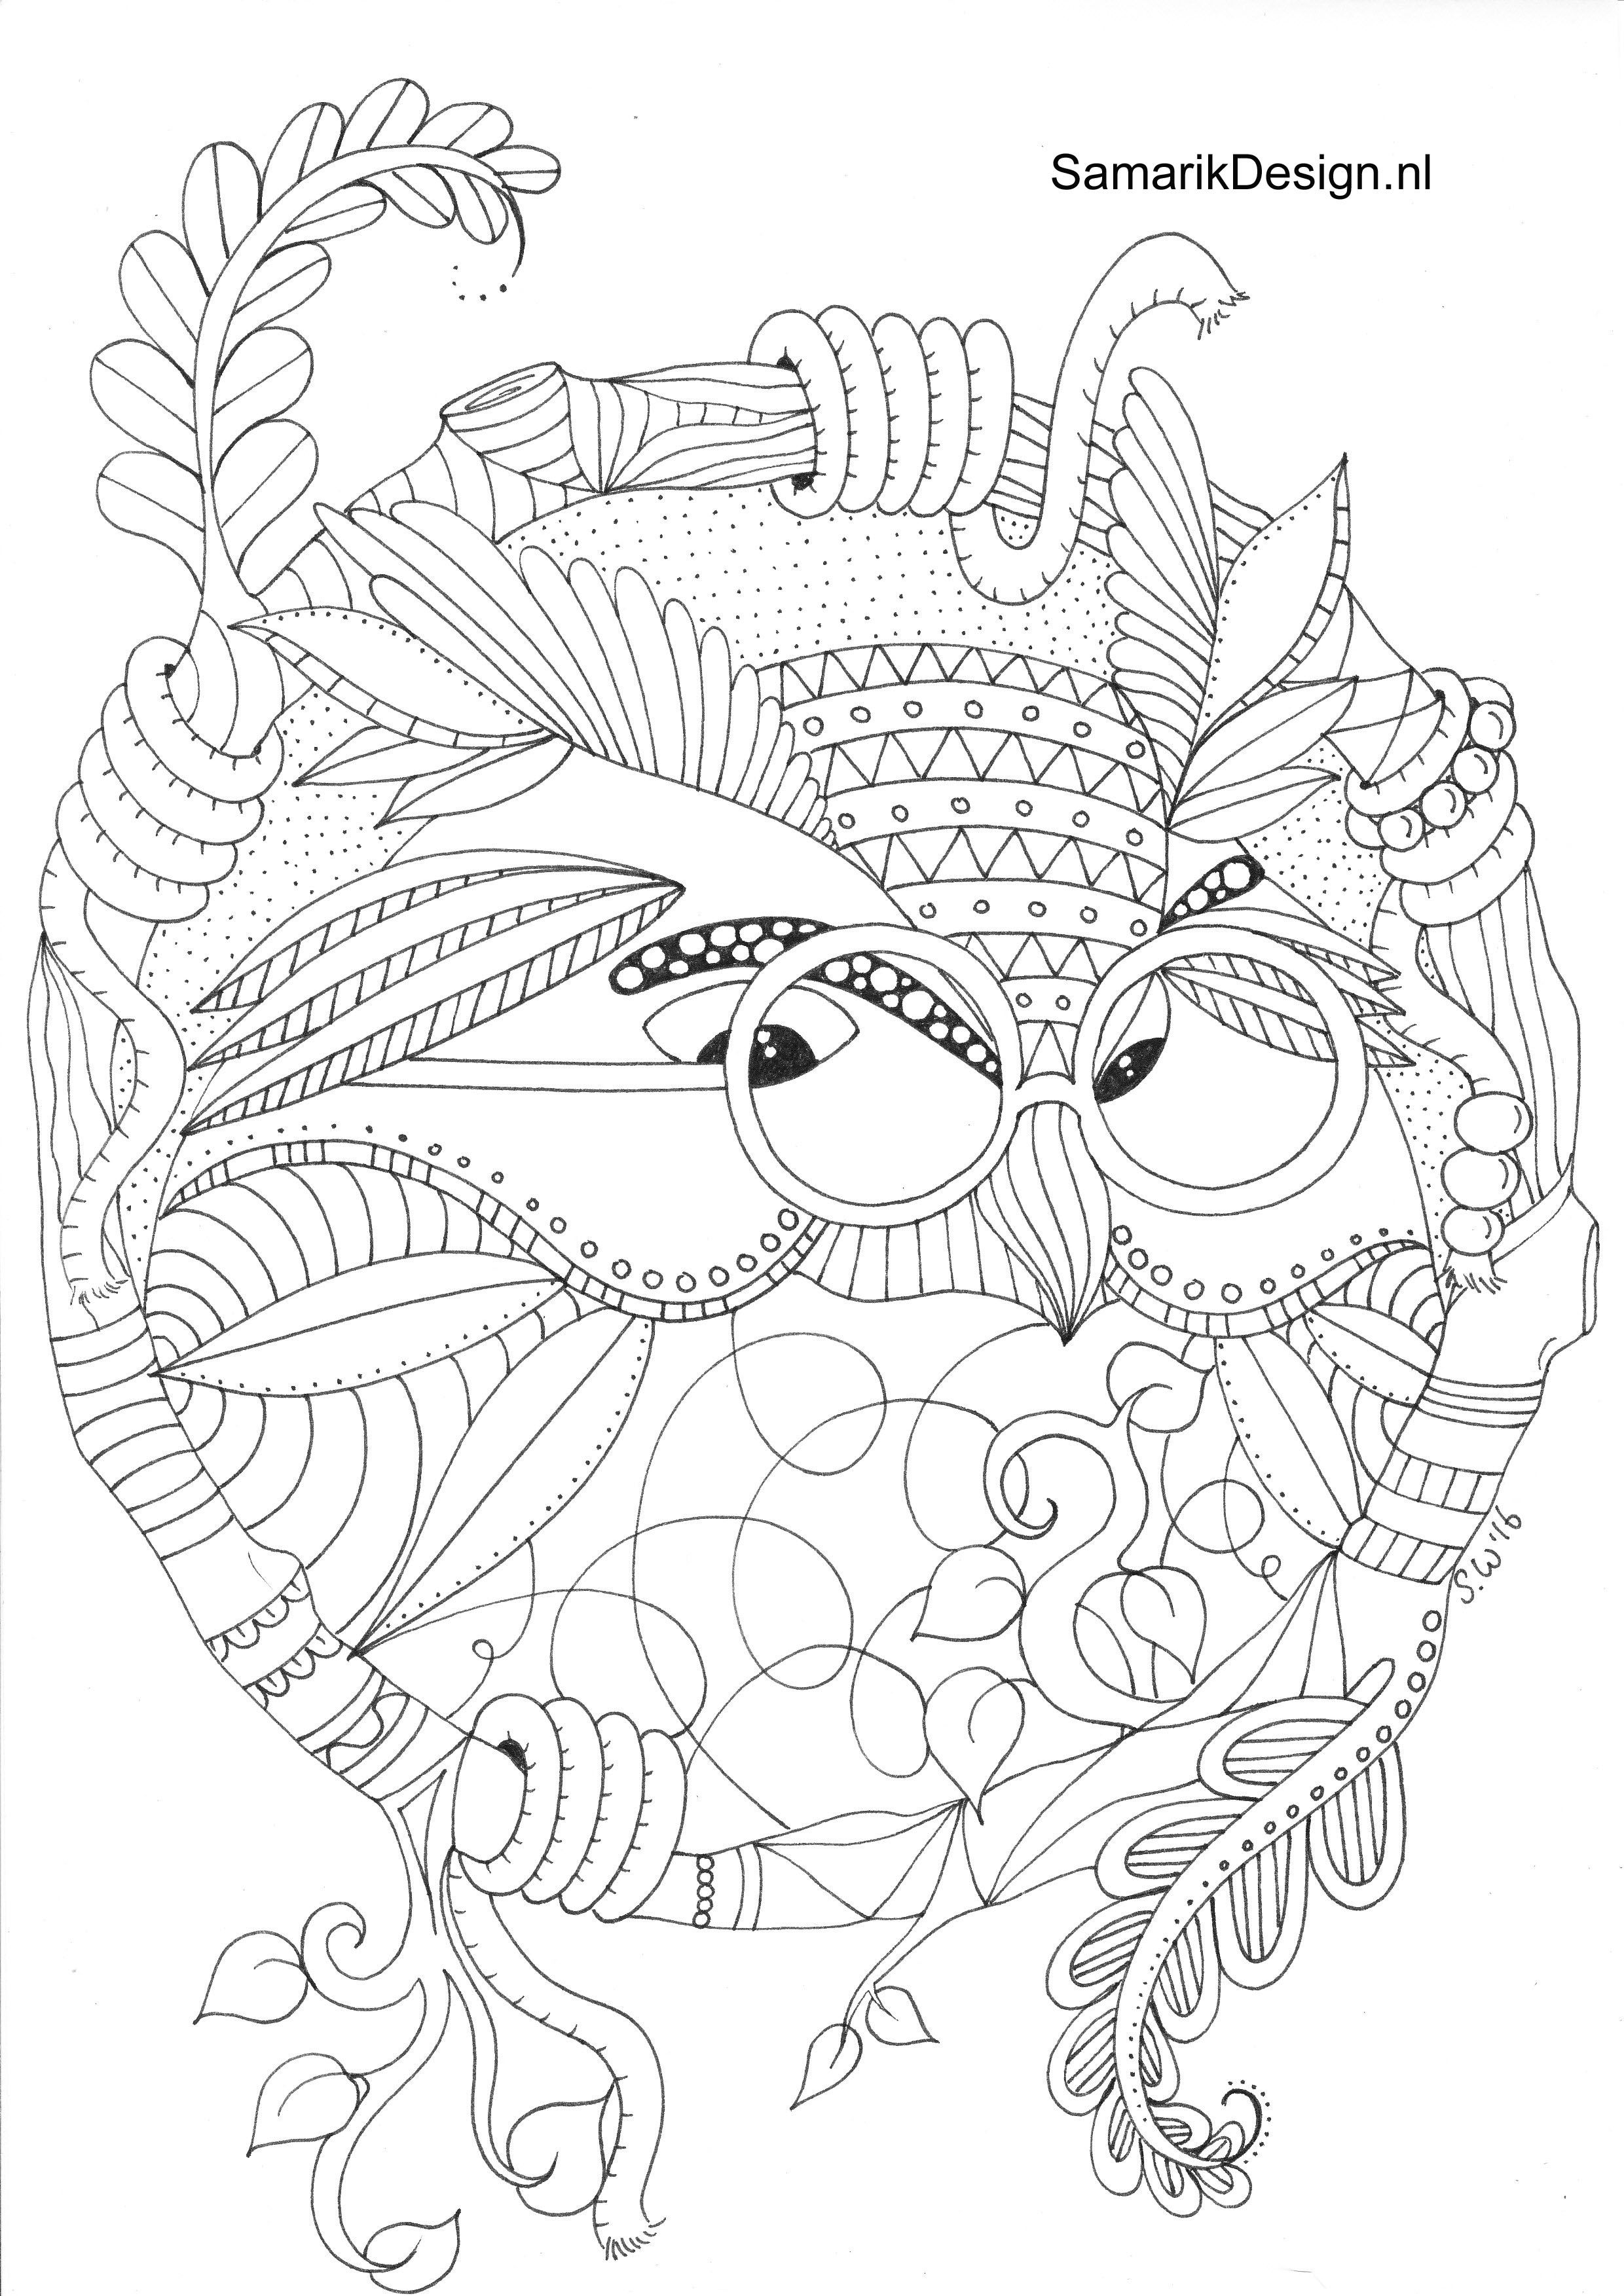 Kleurplaten Mandala Pdf.Geniaal Mandala Kleurplaten Voor Volwassenen Uil Klupaats